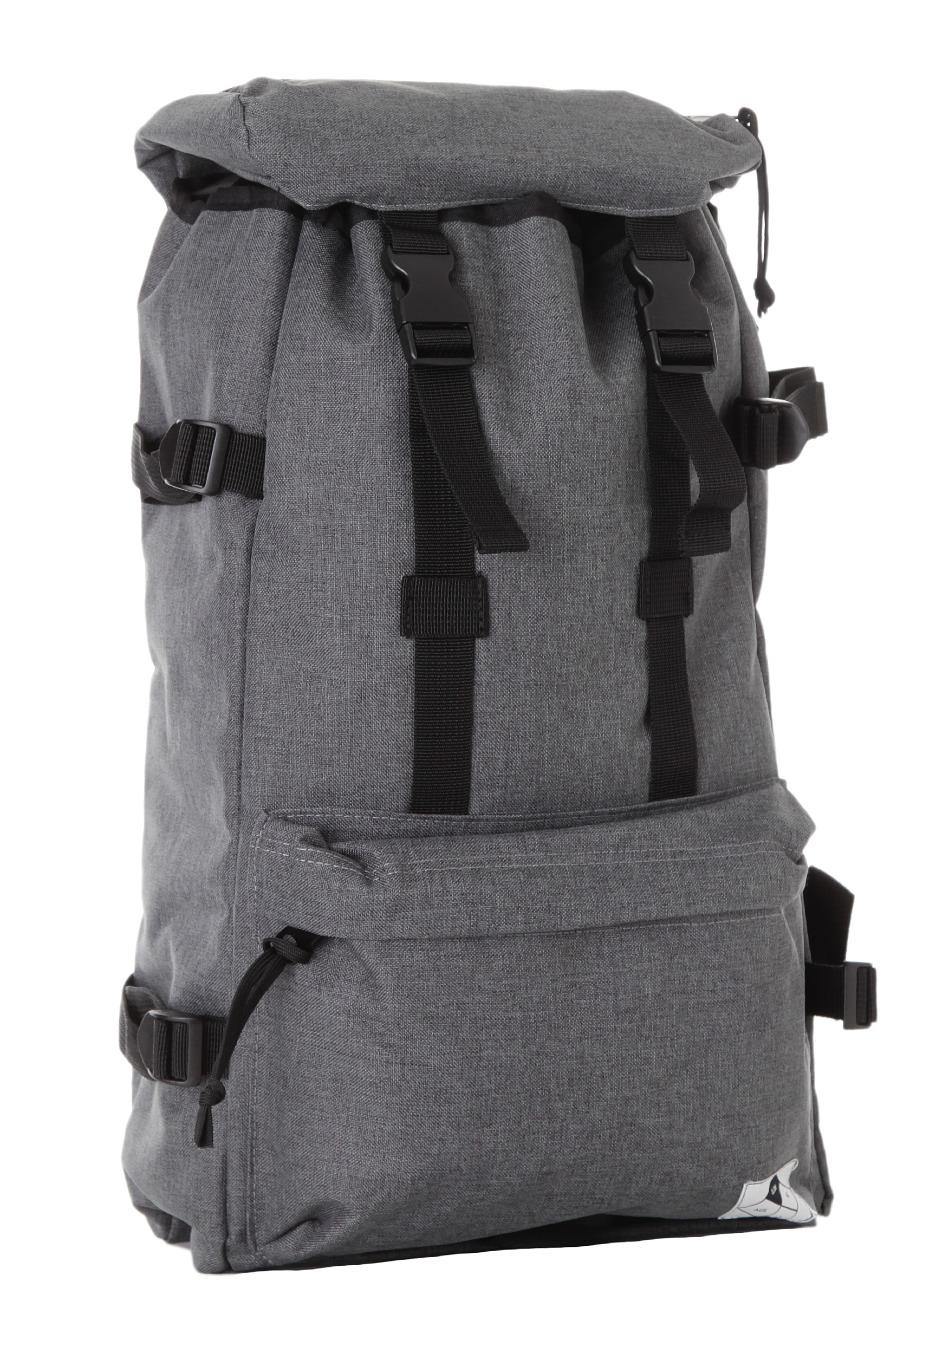 d9eba67463a5 Globe - Pioneer Charcoal - Backpack - Streetwear Shop - Impericon.com US